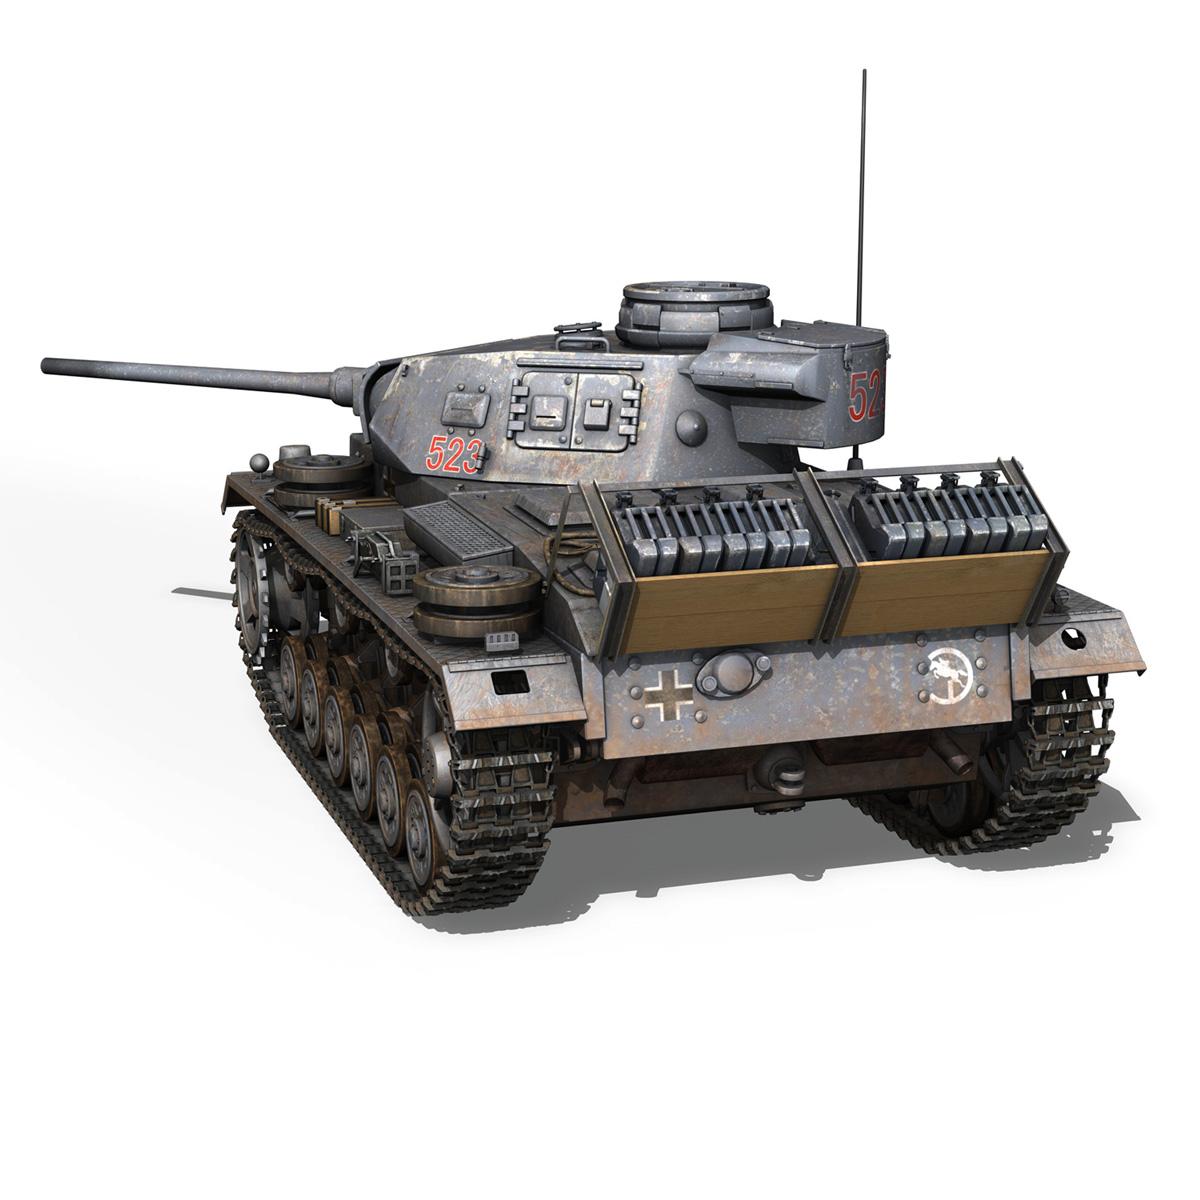 pzkpfw iii – panzer 3 – ausf.j – 523 3d model 3ds fbx c4d lwo obj 189078